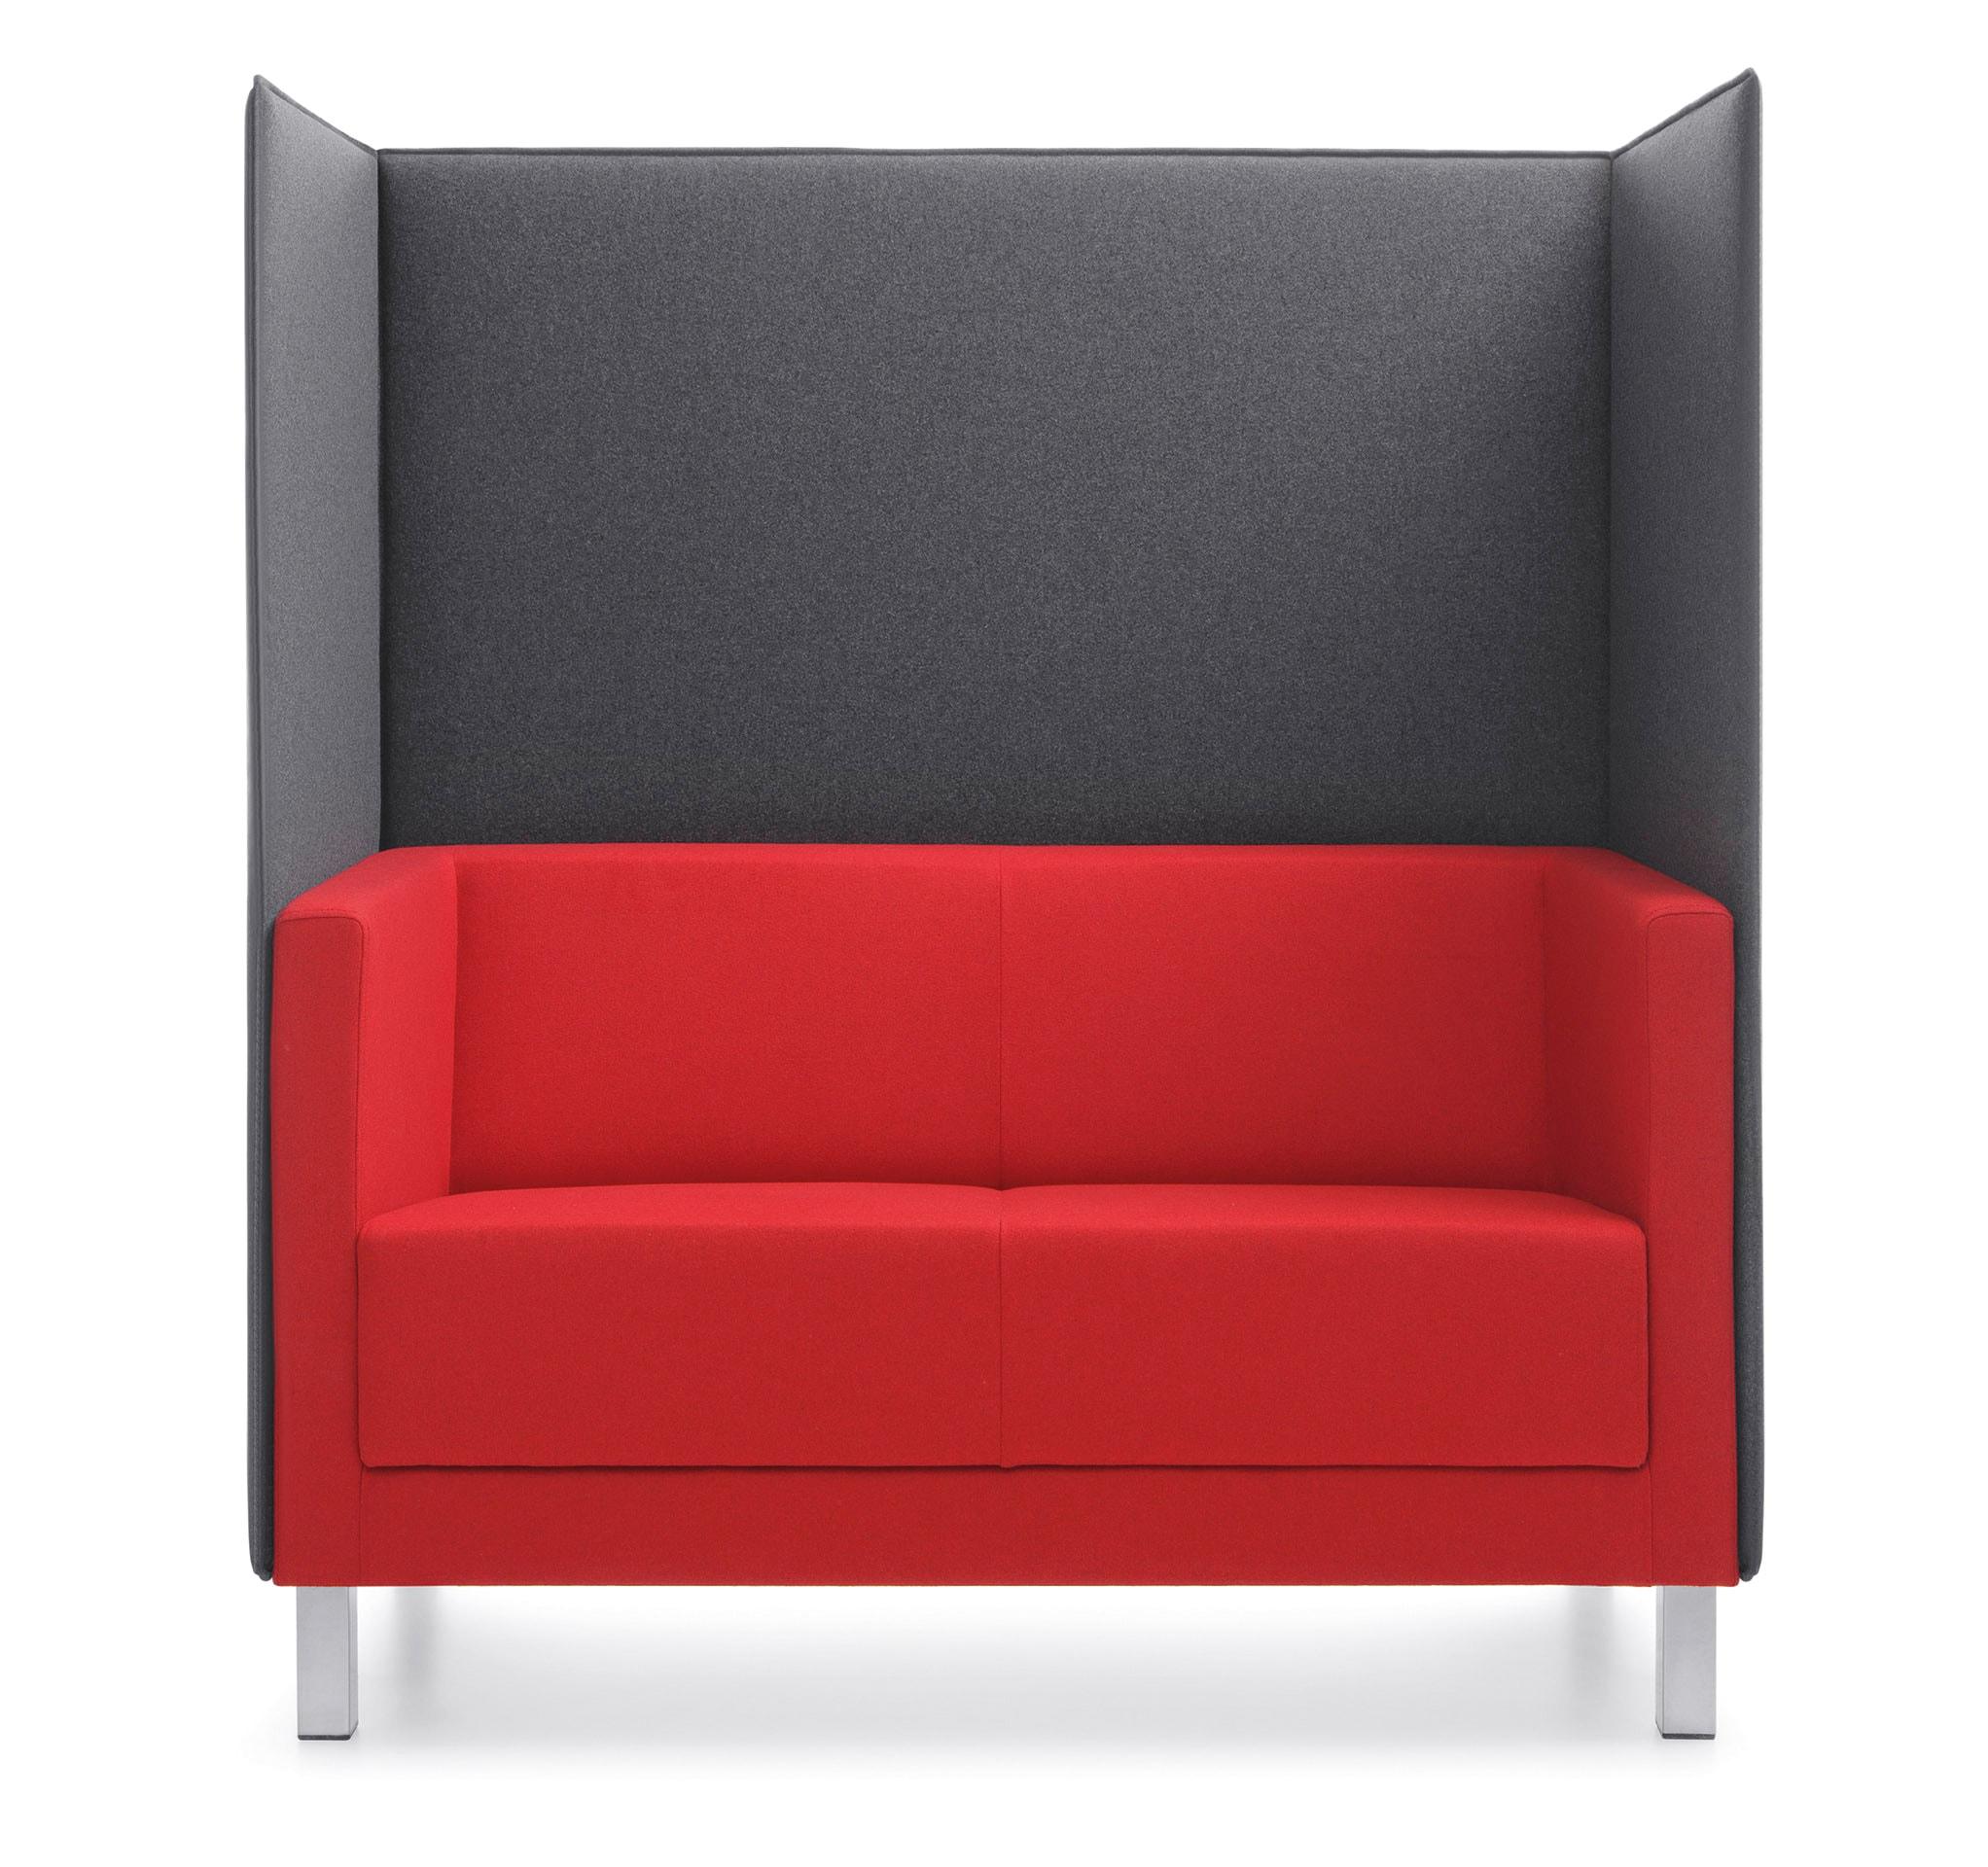 Full Size of Sitboprivacy Sofa Bezug Schwer Entflammbar Preiswert Online Modulares Ottomane Mit Recamiere Indomo Lounge Garten Hocker Big Schlaffunktion Abnehmbarer Sofa Sofa Bezug